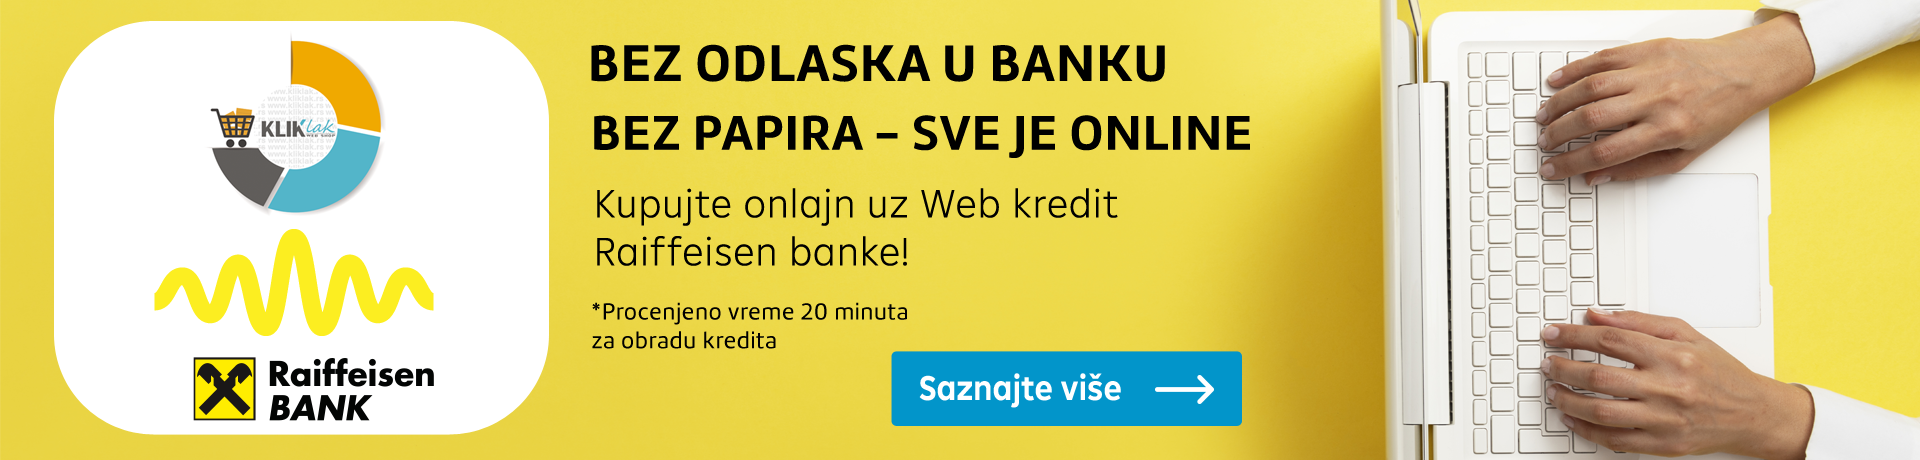 web-krediti-kliklak-raiffeisen-bank